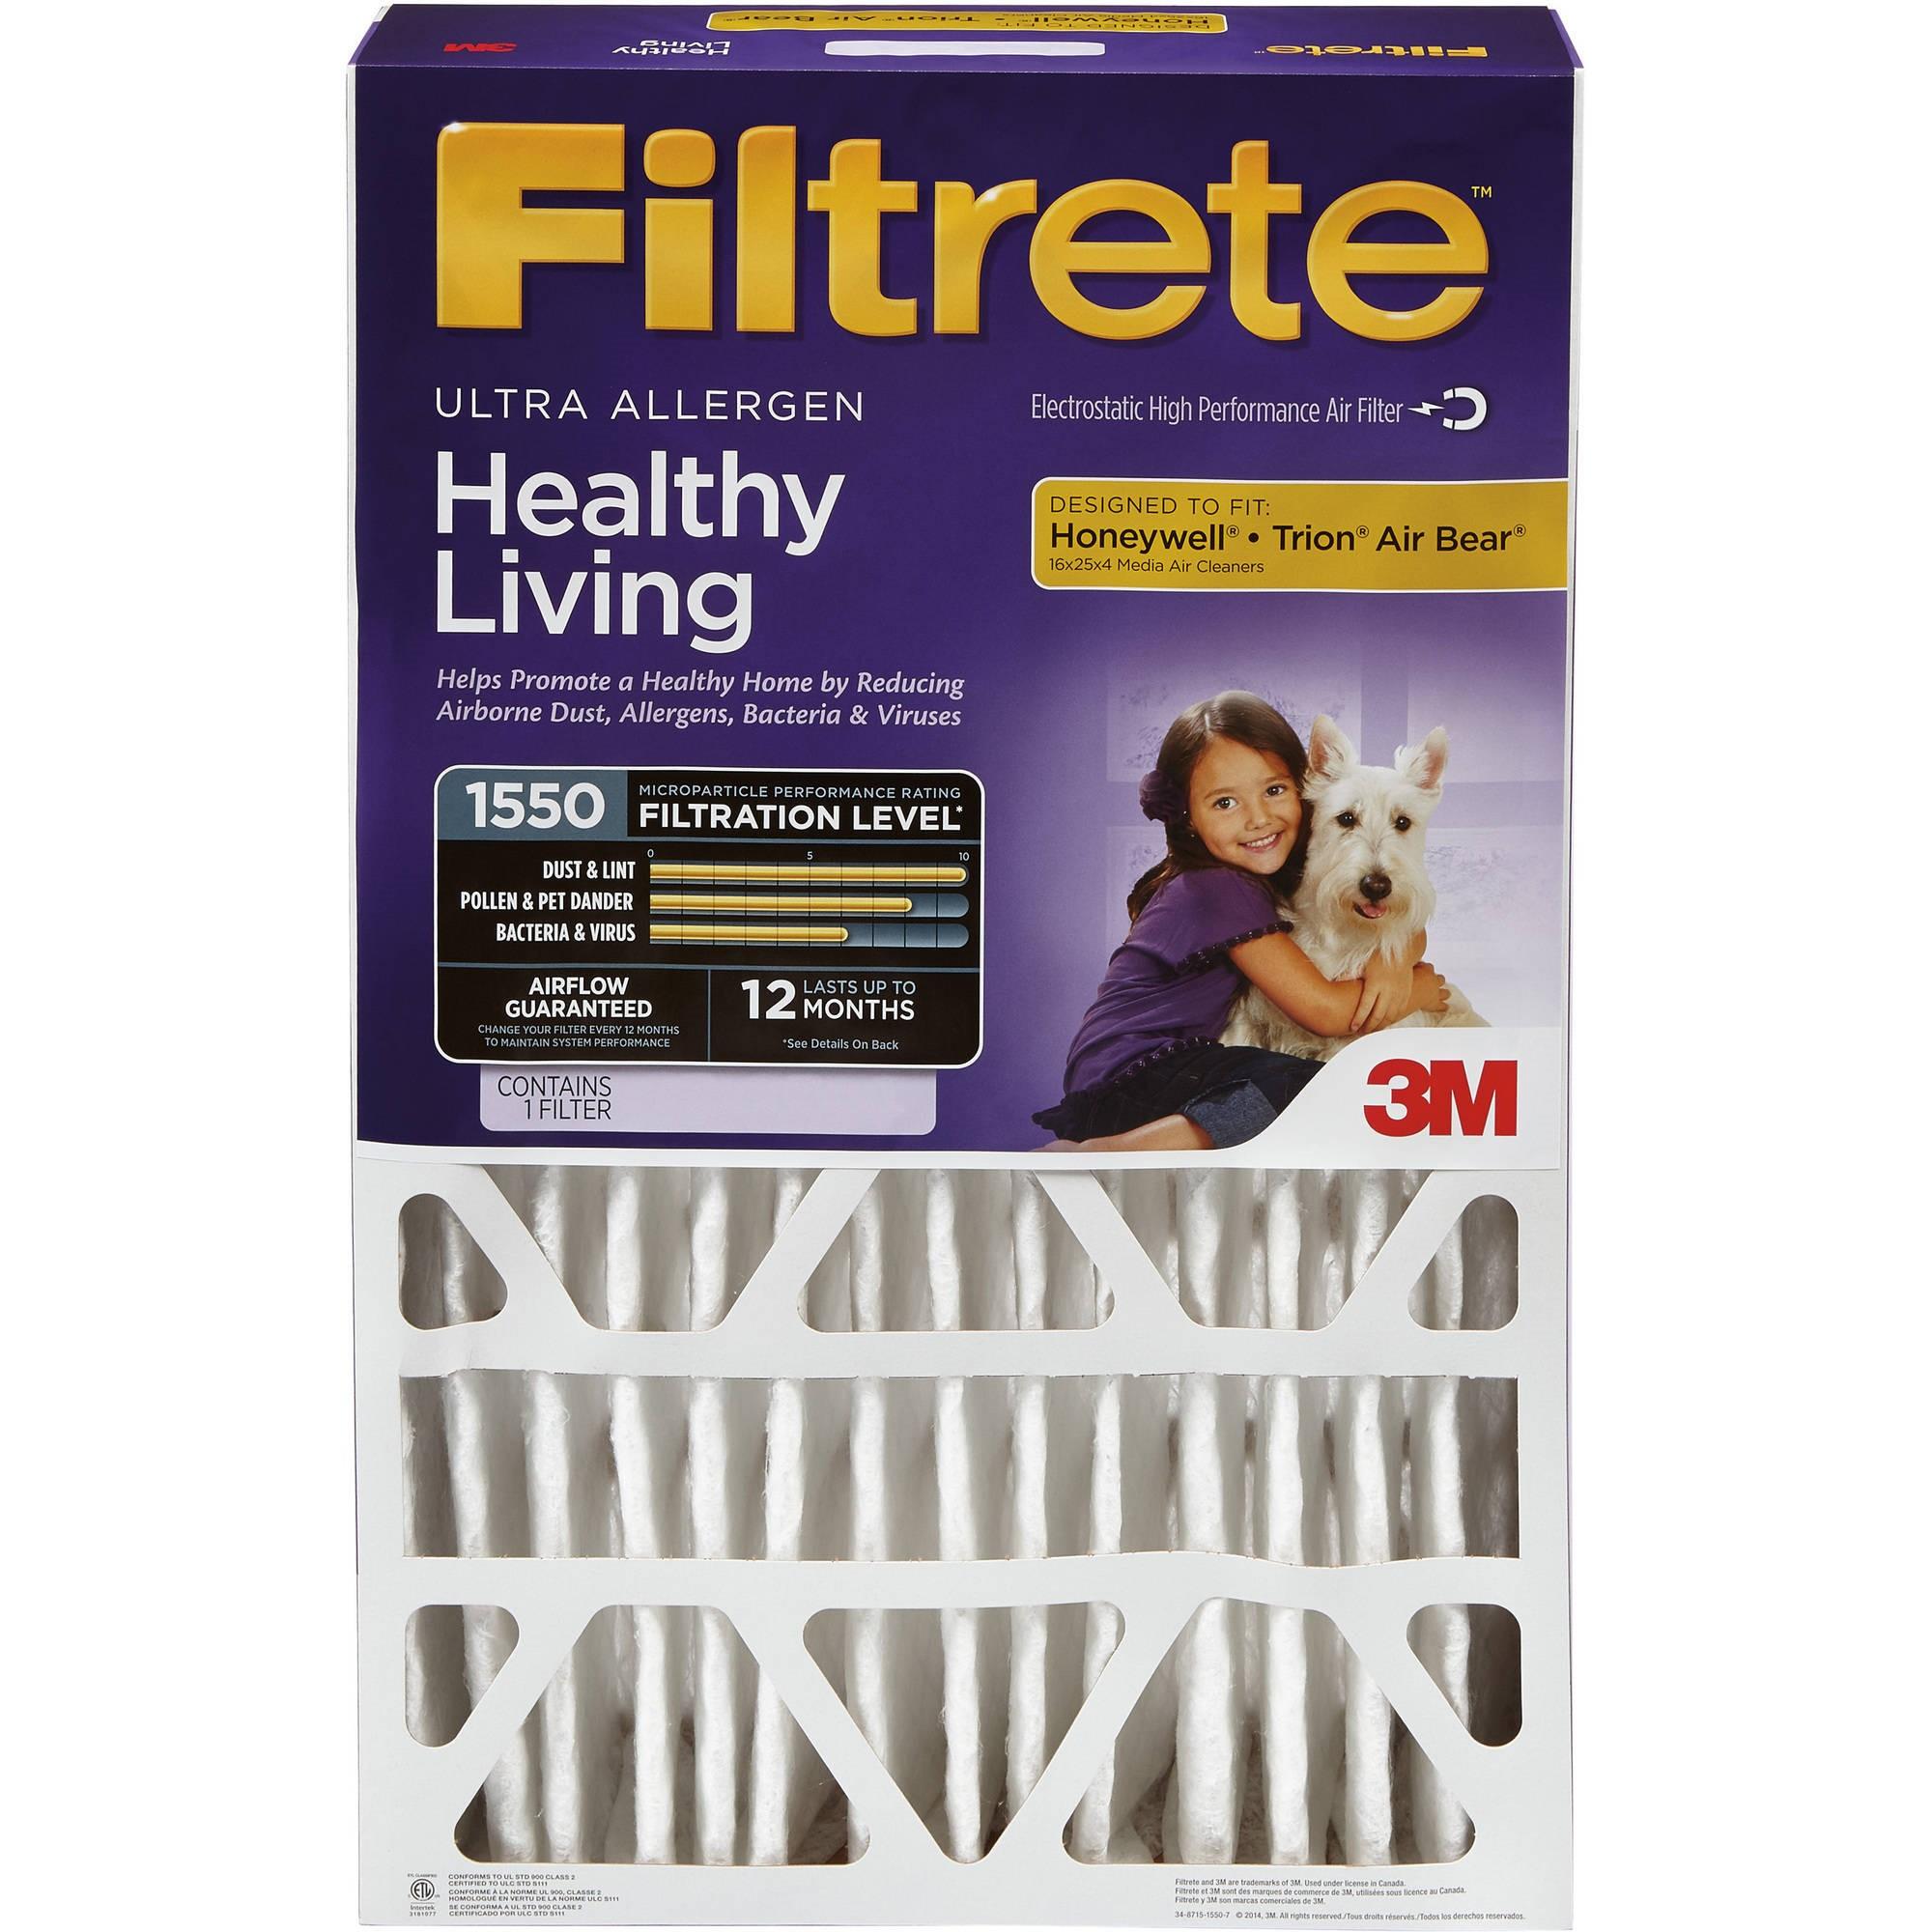 Filtrete Allergen Reduction Deep Pleat HVAC Furnace Air Filter, 1550 MPR, 20 x 25 x 4, 1 Filter